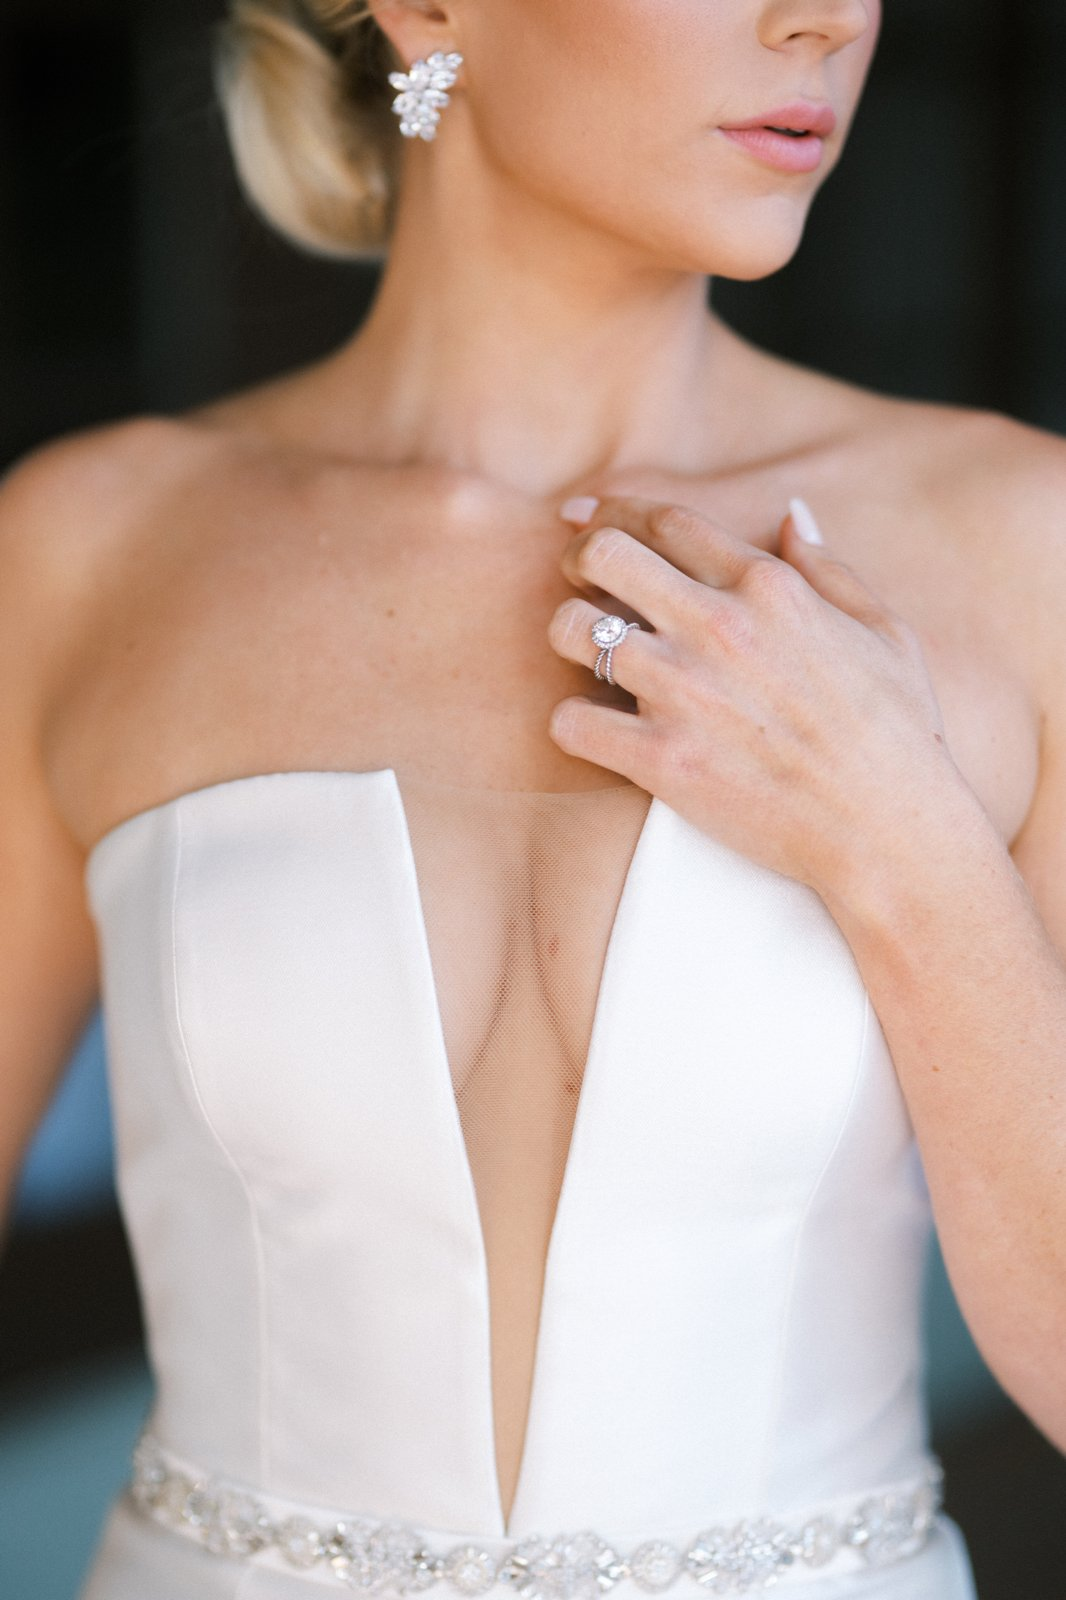 dallas_wedding_photographer_akppricing_003